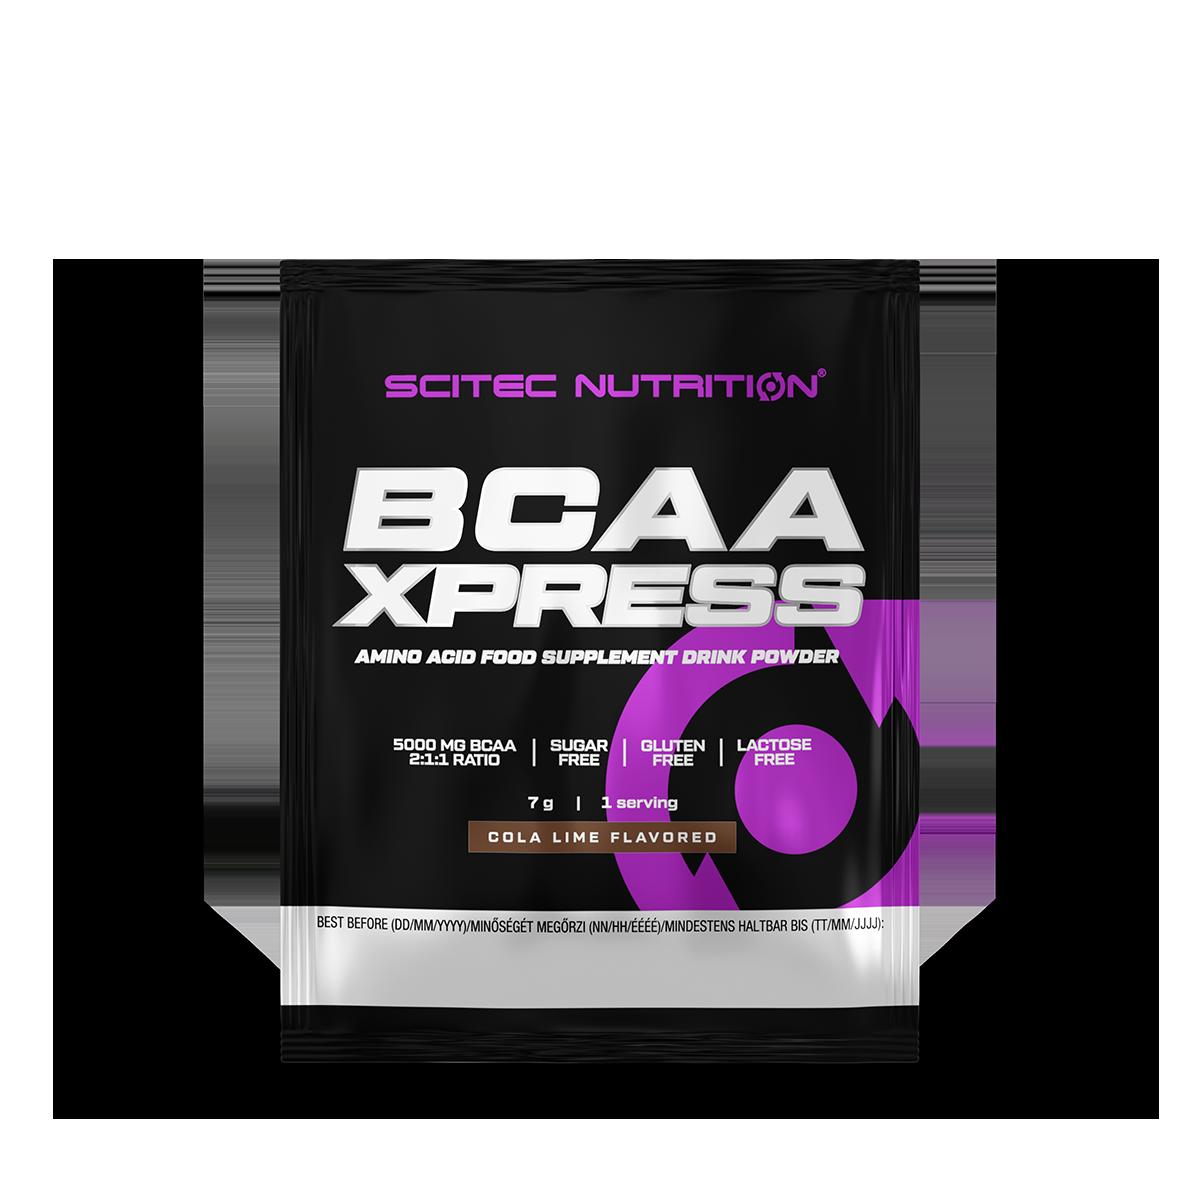 Scitec Nutrition BCAA-Xpress 7 gr.